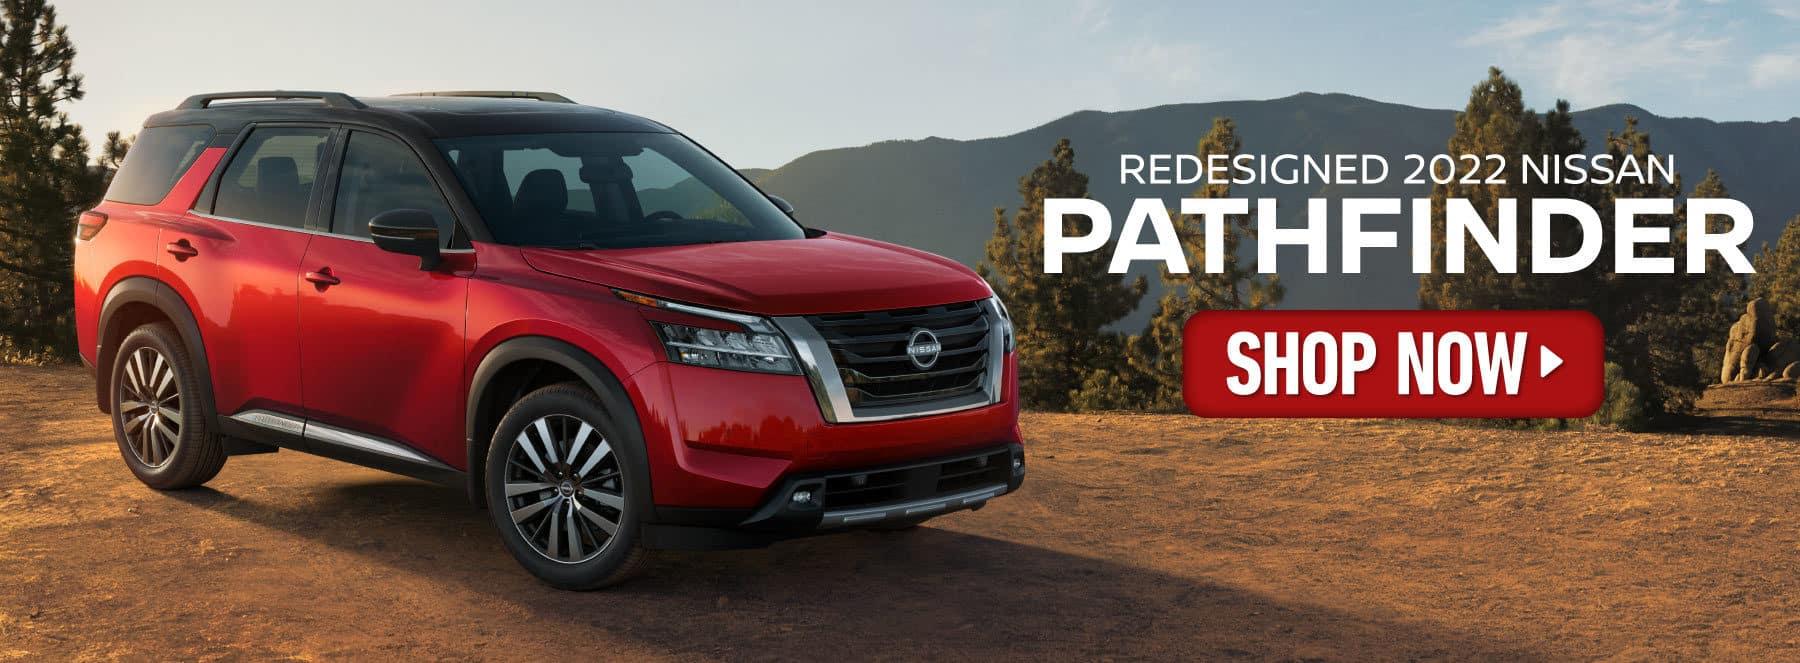 2022 Nissan Pathfinder | Act Now